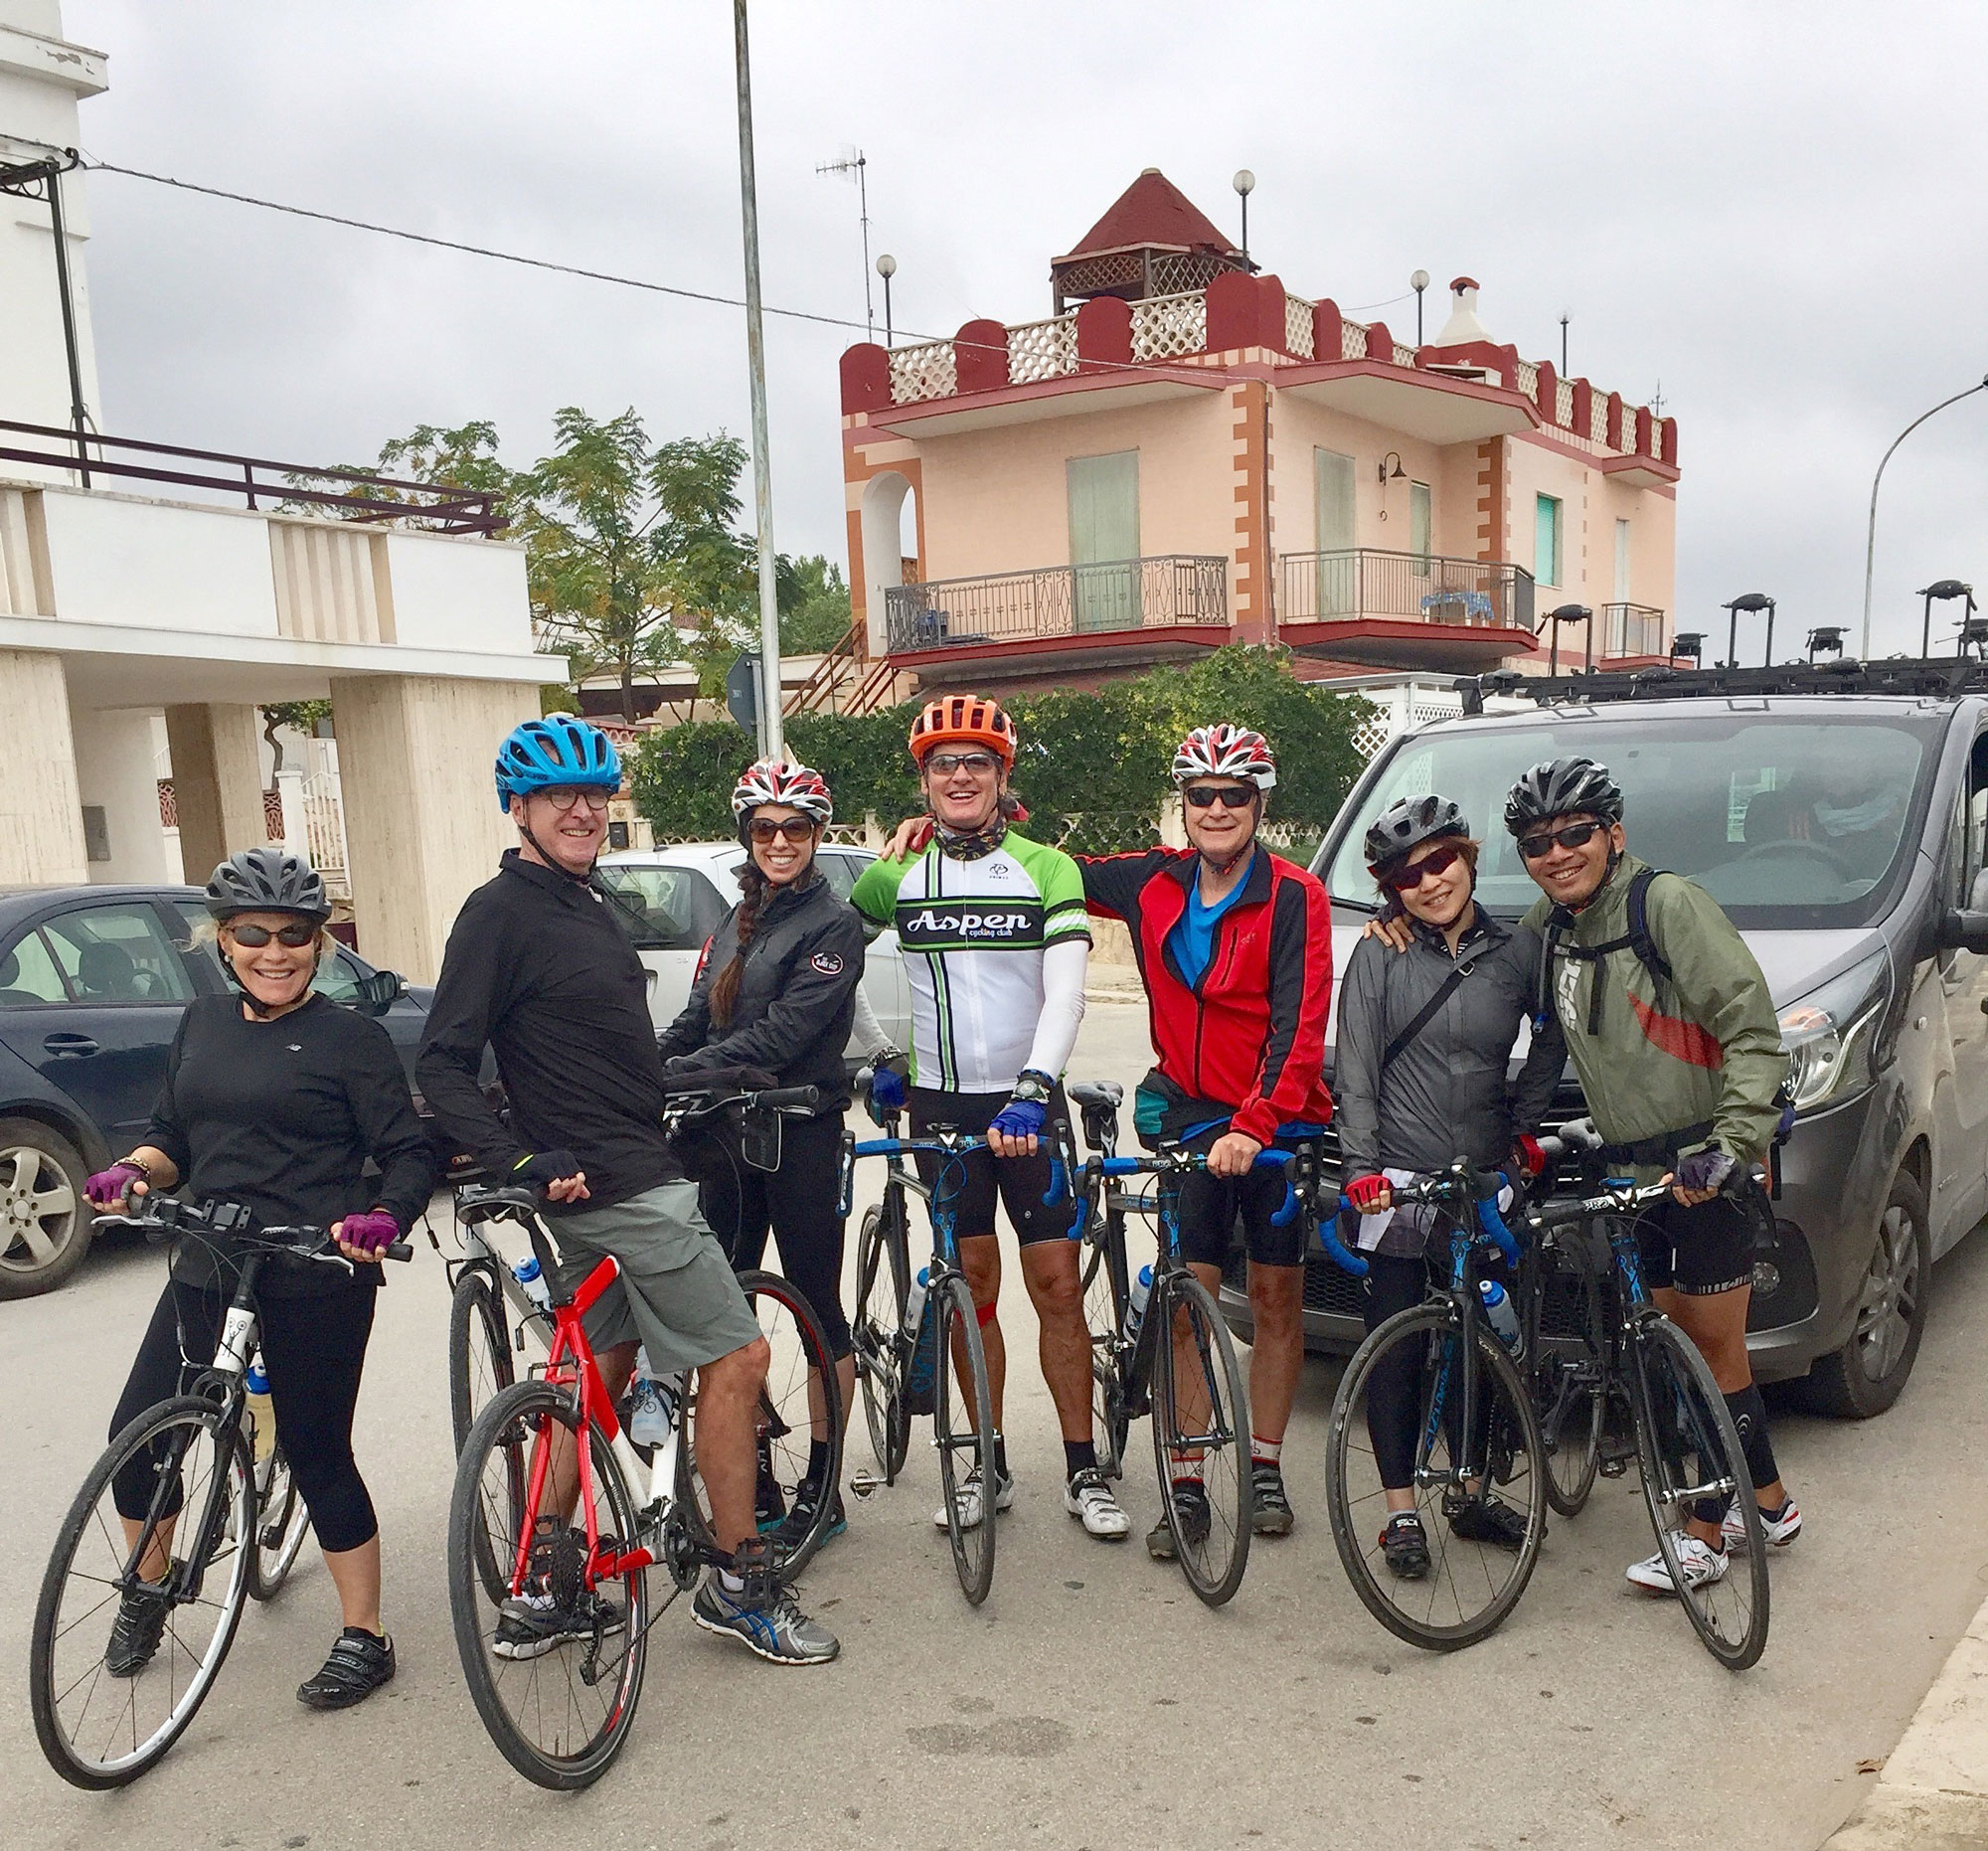 Puglia Bike Tour